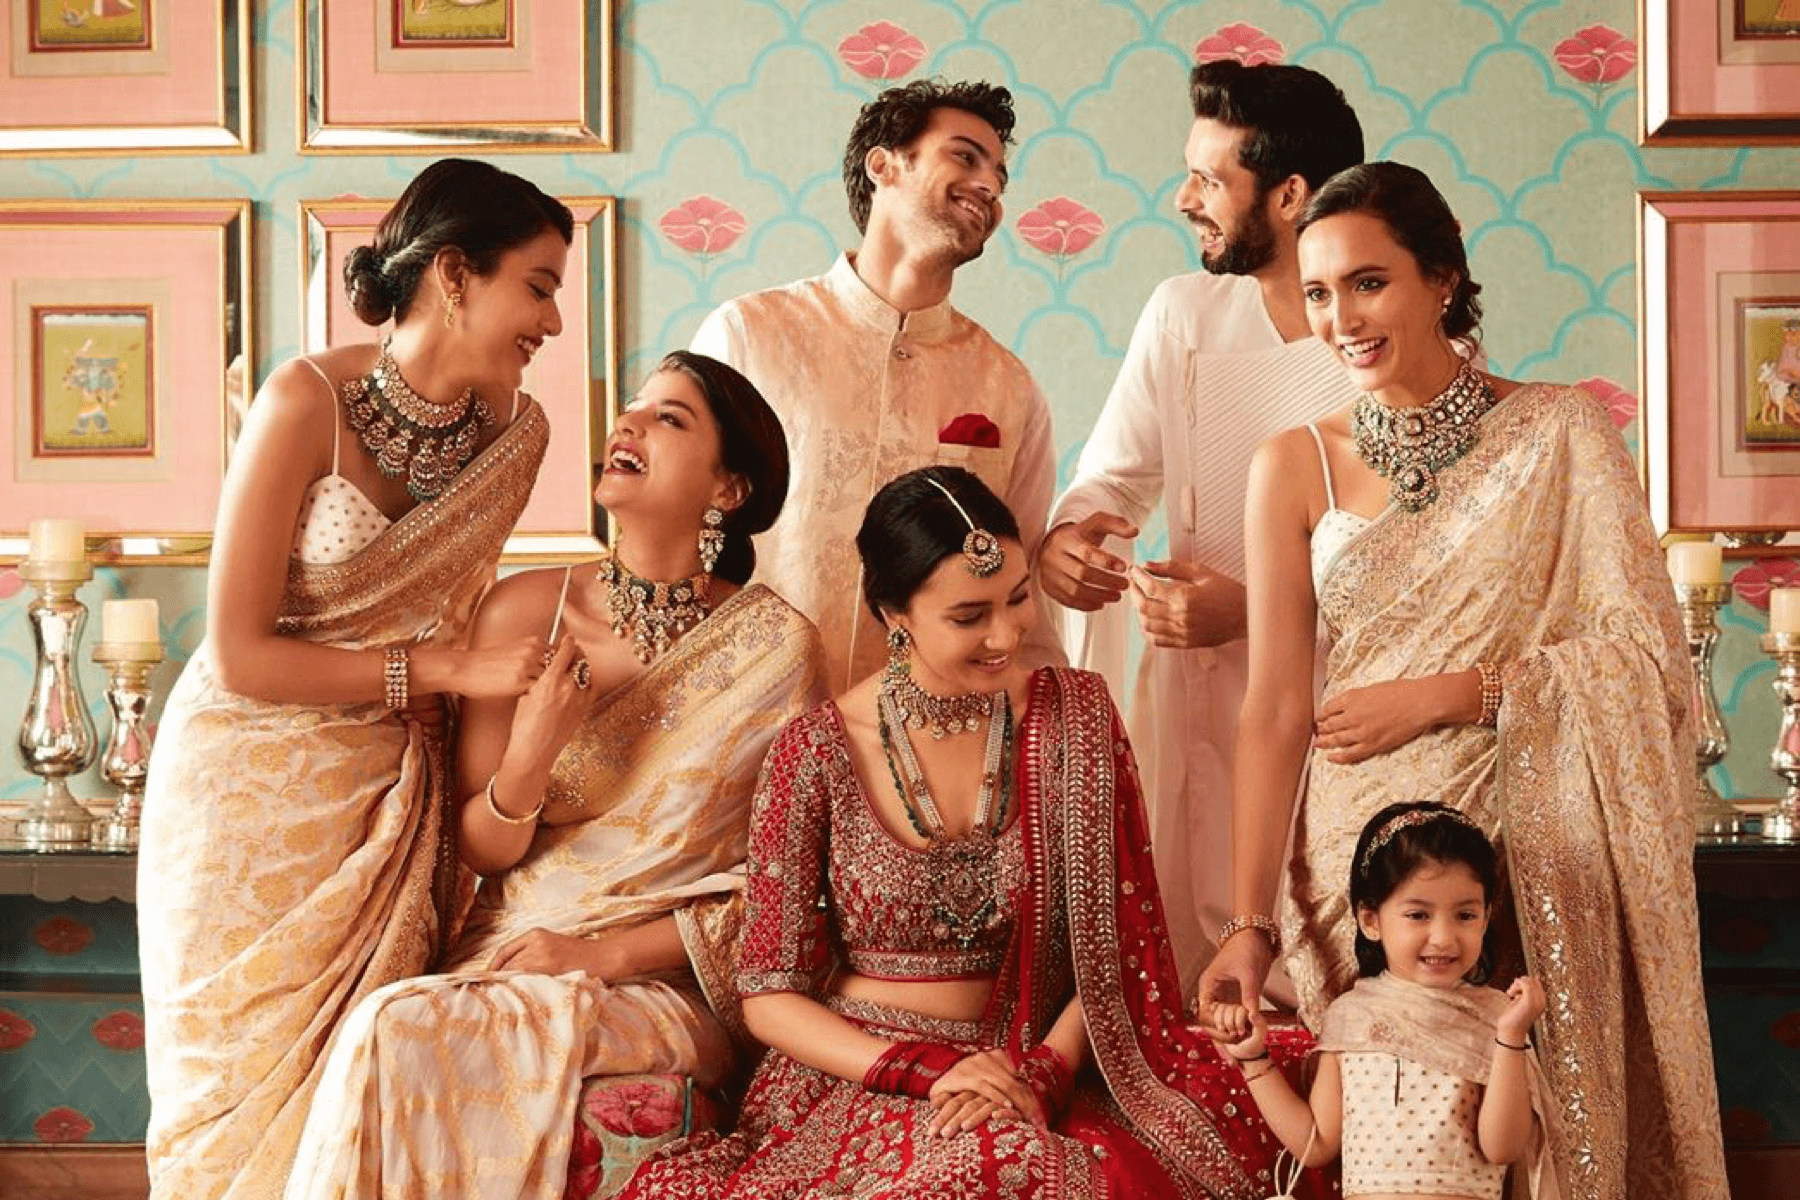 Photo of Indian wedding models in Anita Dongre designs